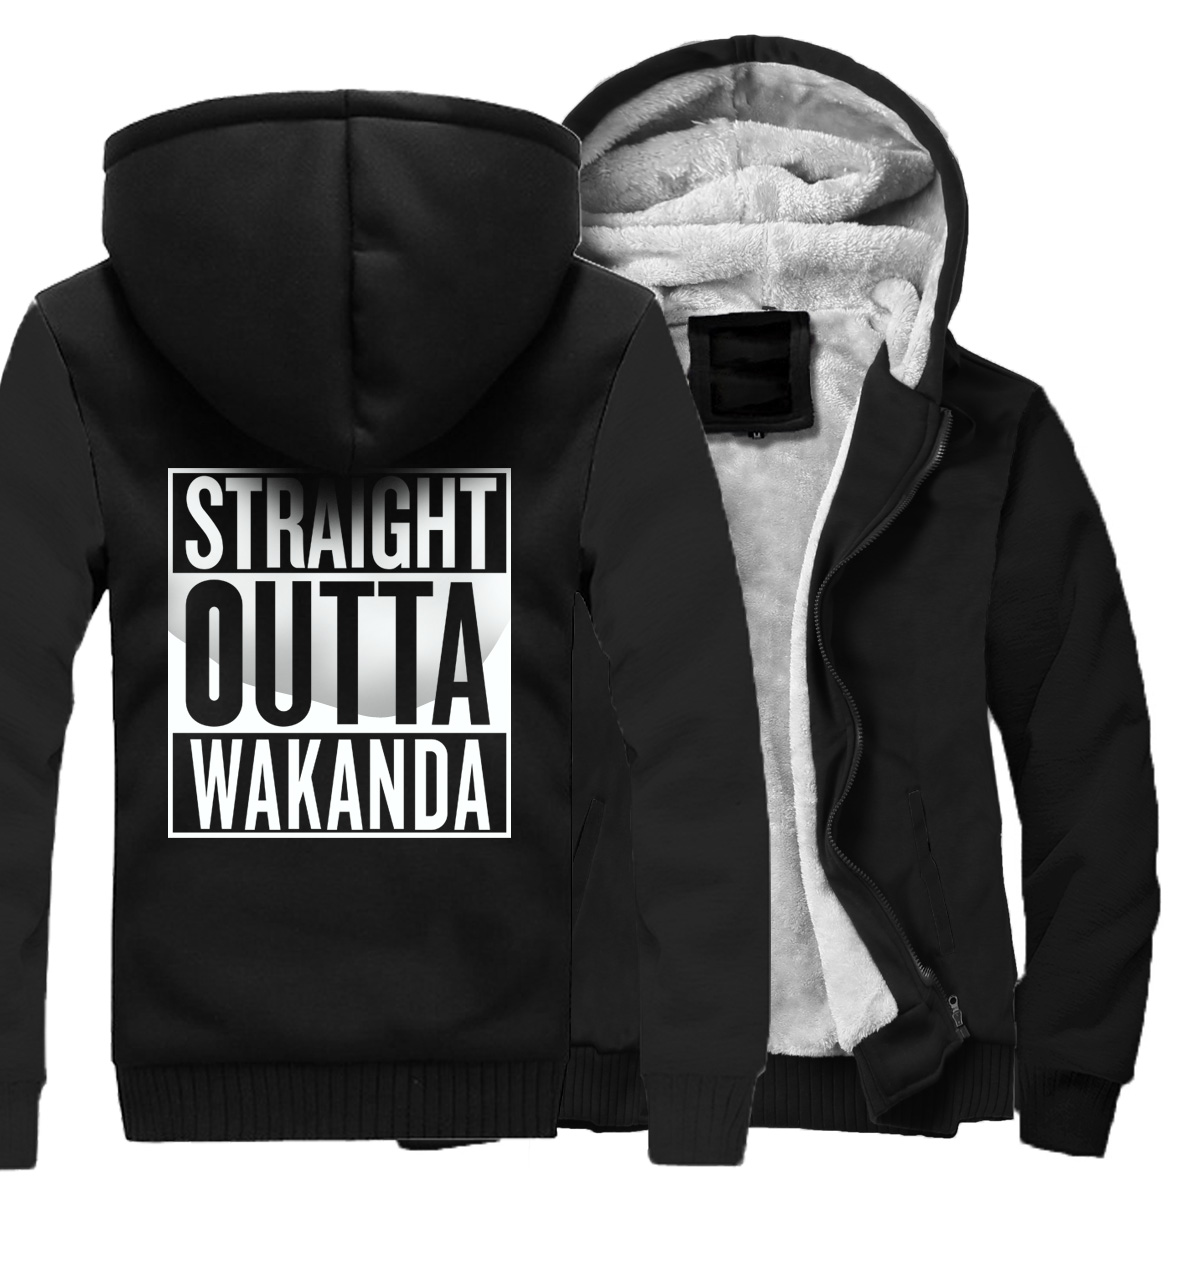 STRAIGHT OUTTA WAKANDA Hip Hop Hoodies Men Jackets 2018 Autumn Winter Fleece Streetwear Black Panther Men's Sweatshirt Jacket